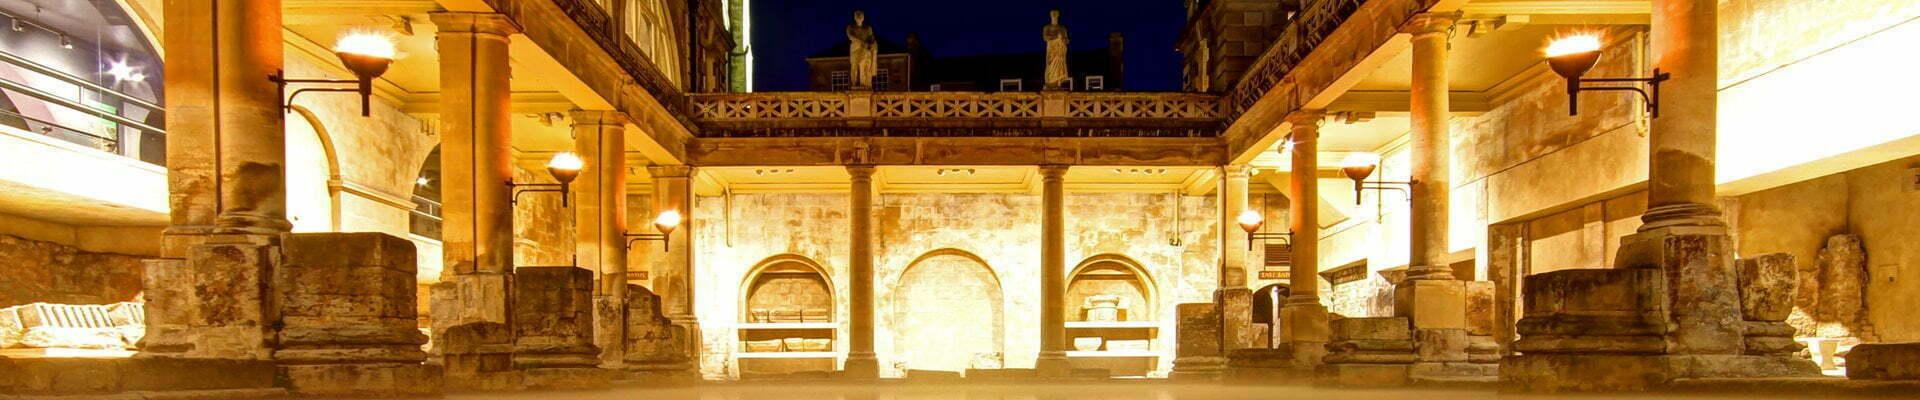 The Great Bath at night in Bath, England.